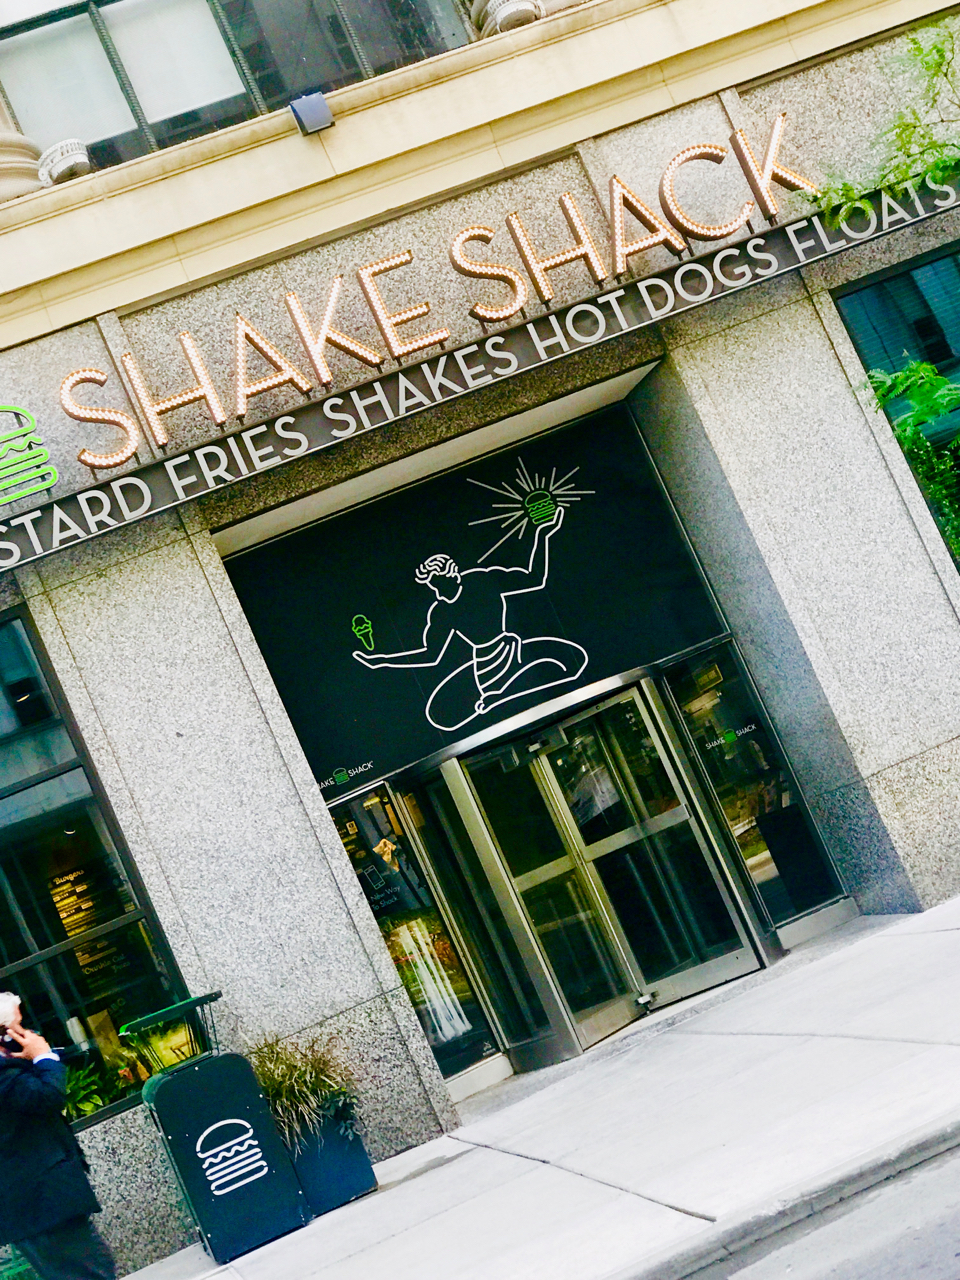 New Development in Shake Shack form